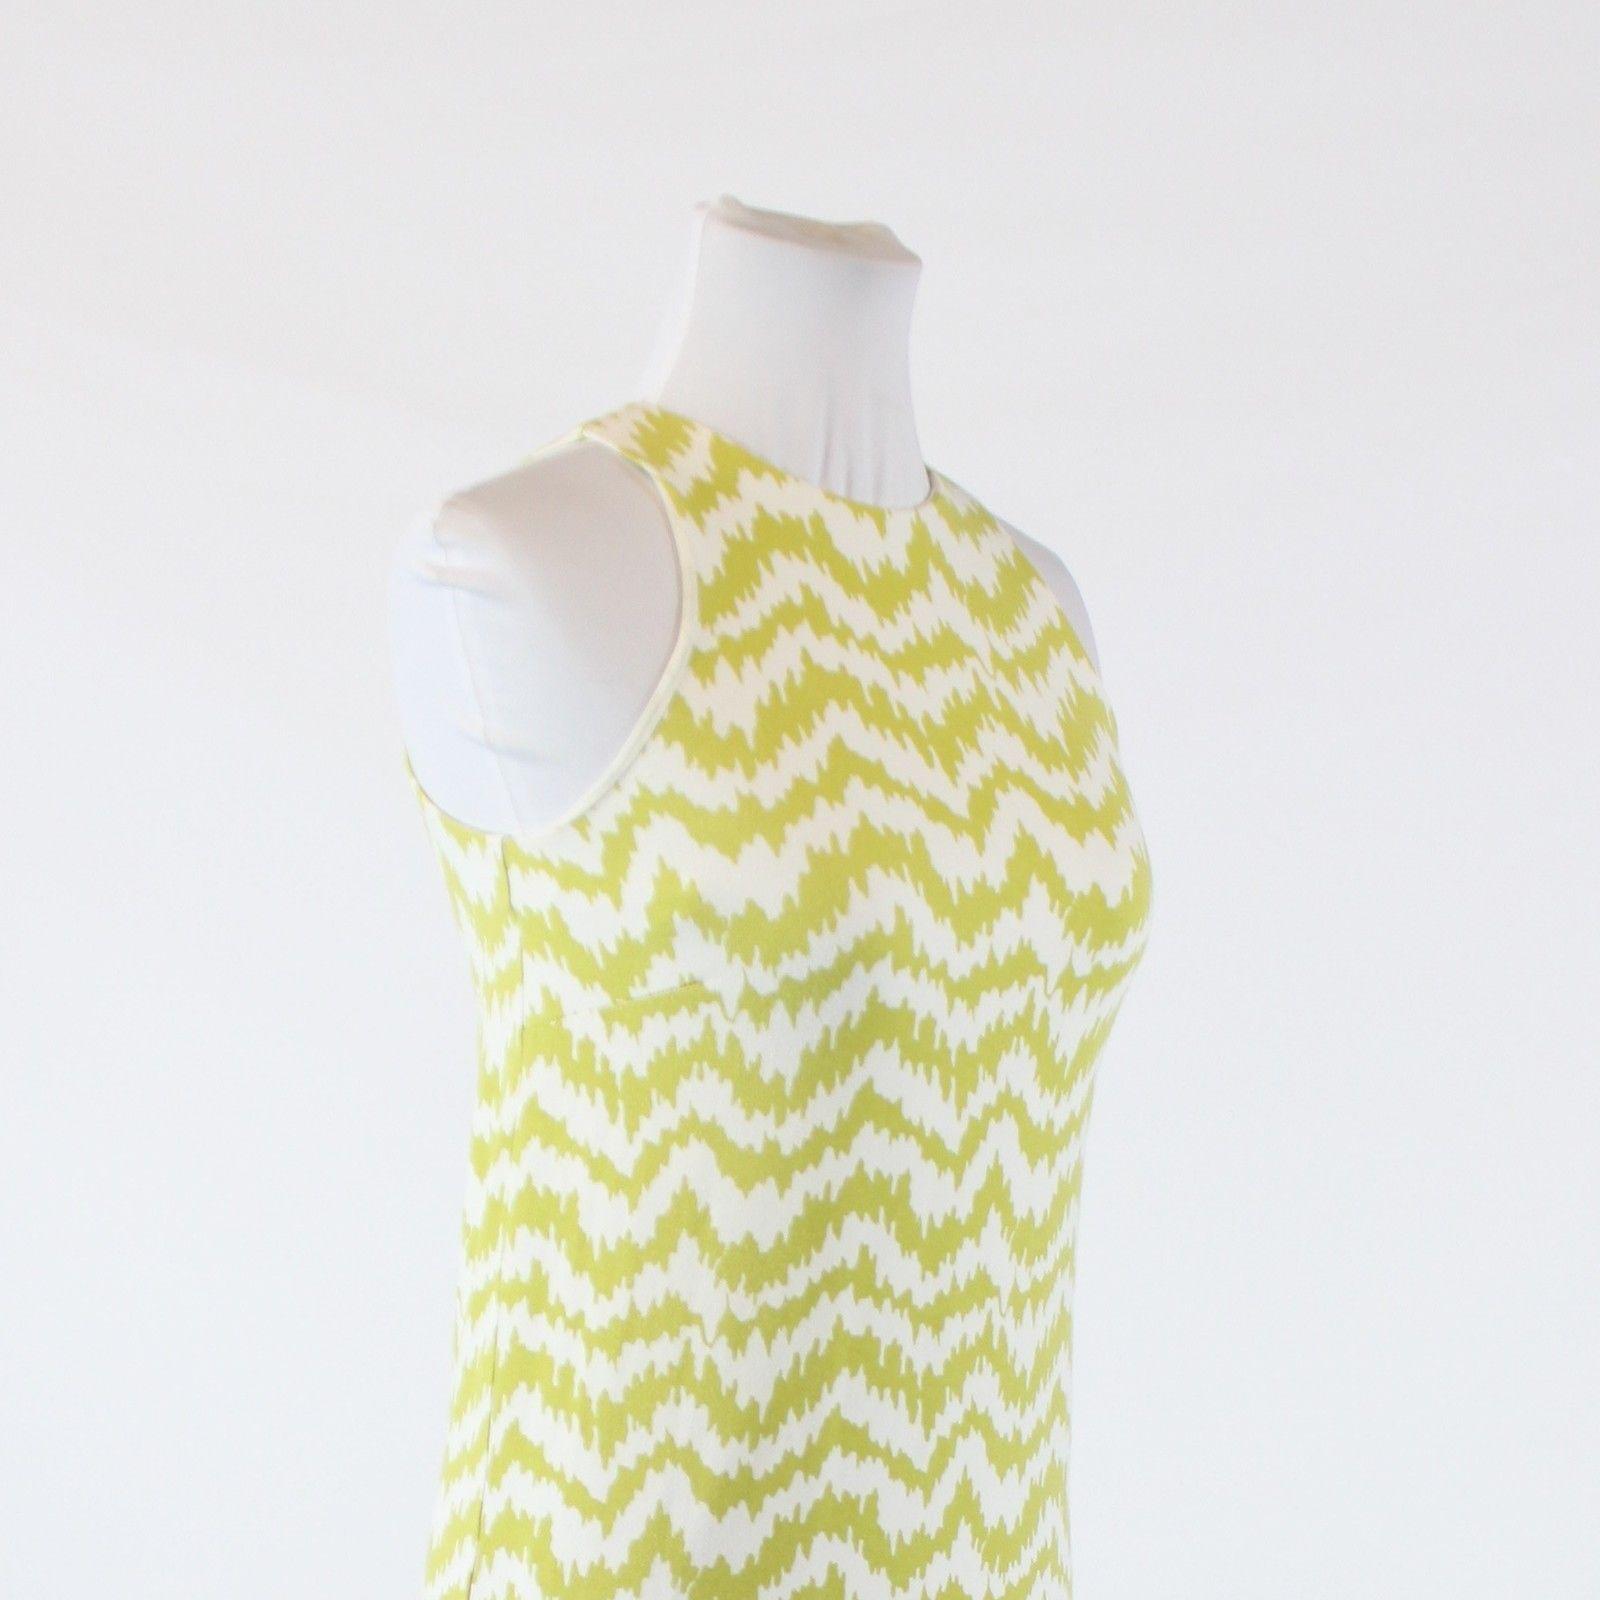 Olive green white geometric stretch ANN TAYLOR sleeveless shift dress PXXS